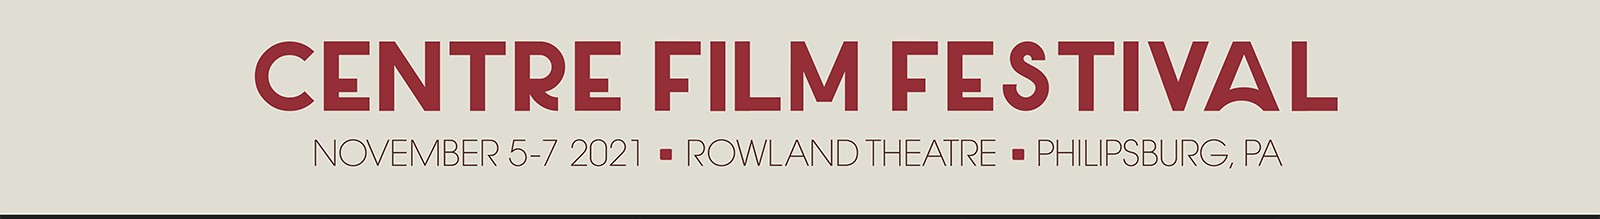 Centre Film Festival 2021